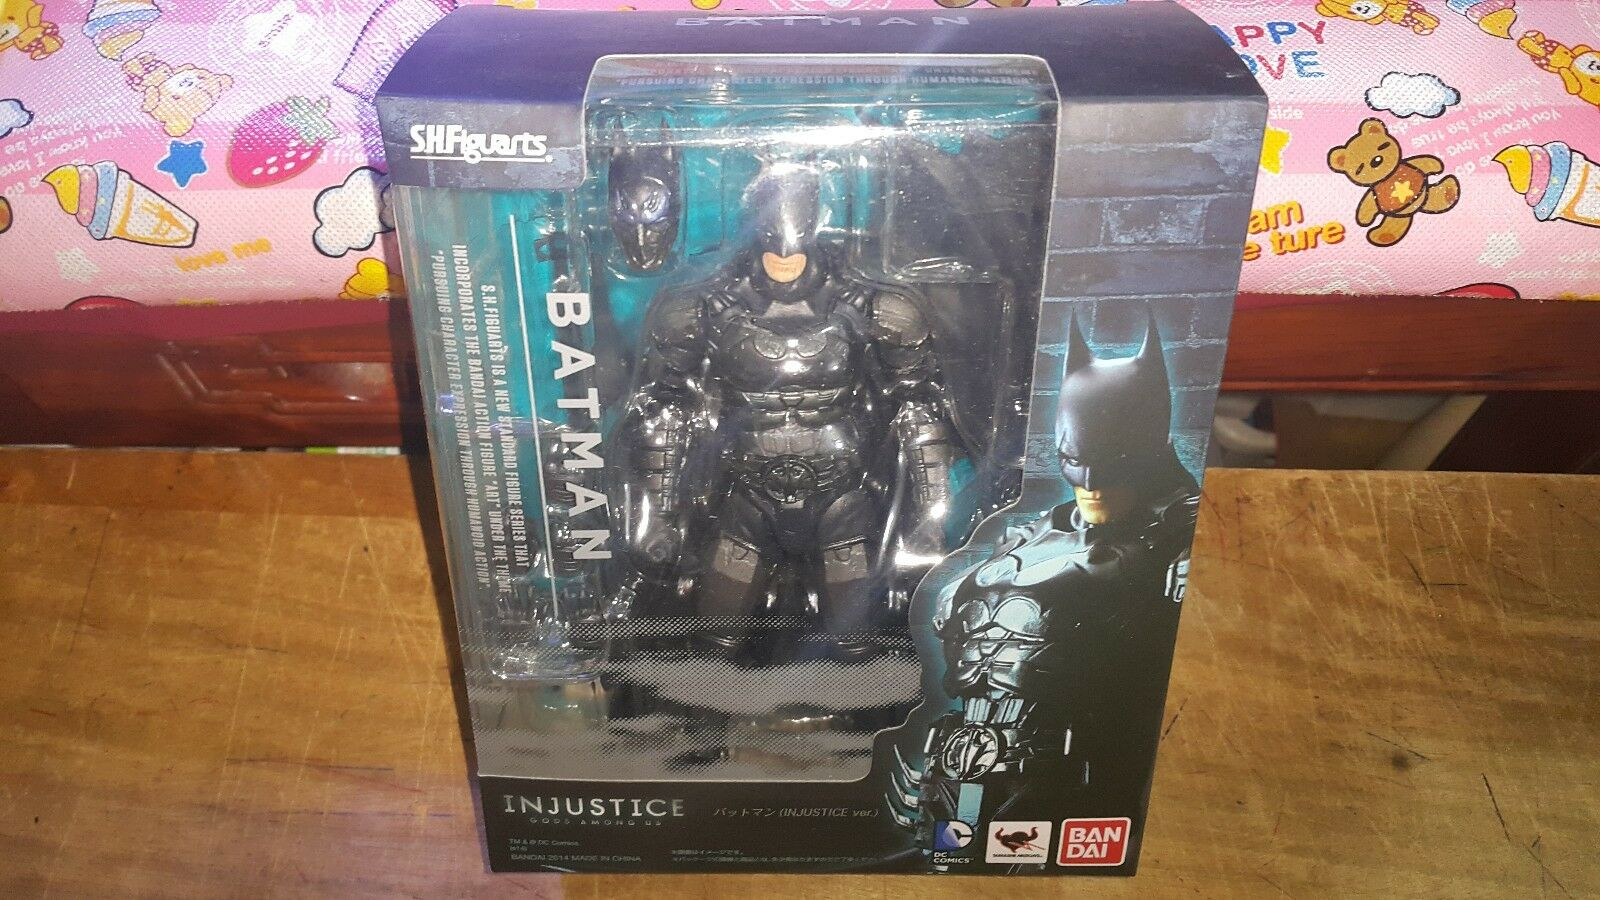 S.H.Figuarts SHF Batman Injustice Ver Action Figure